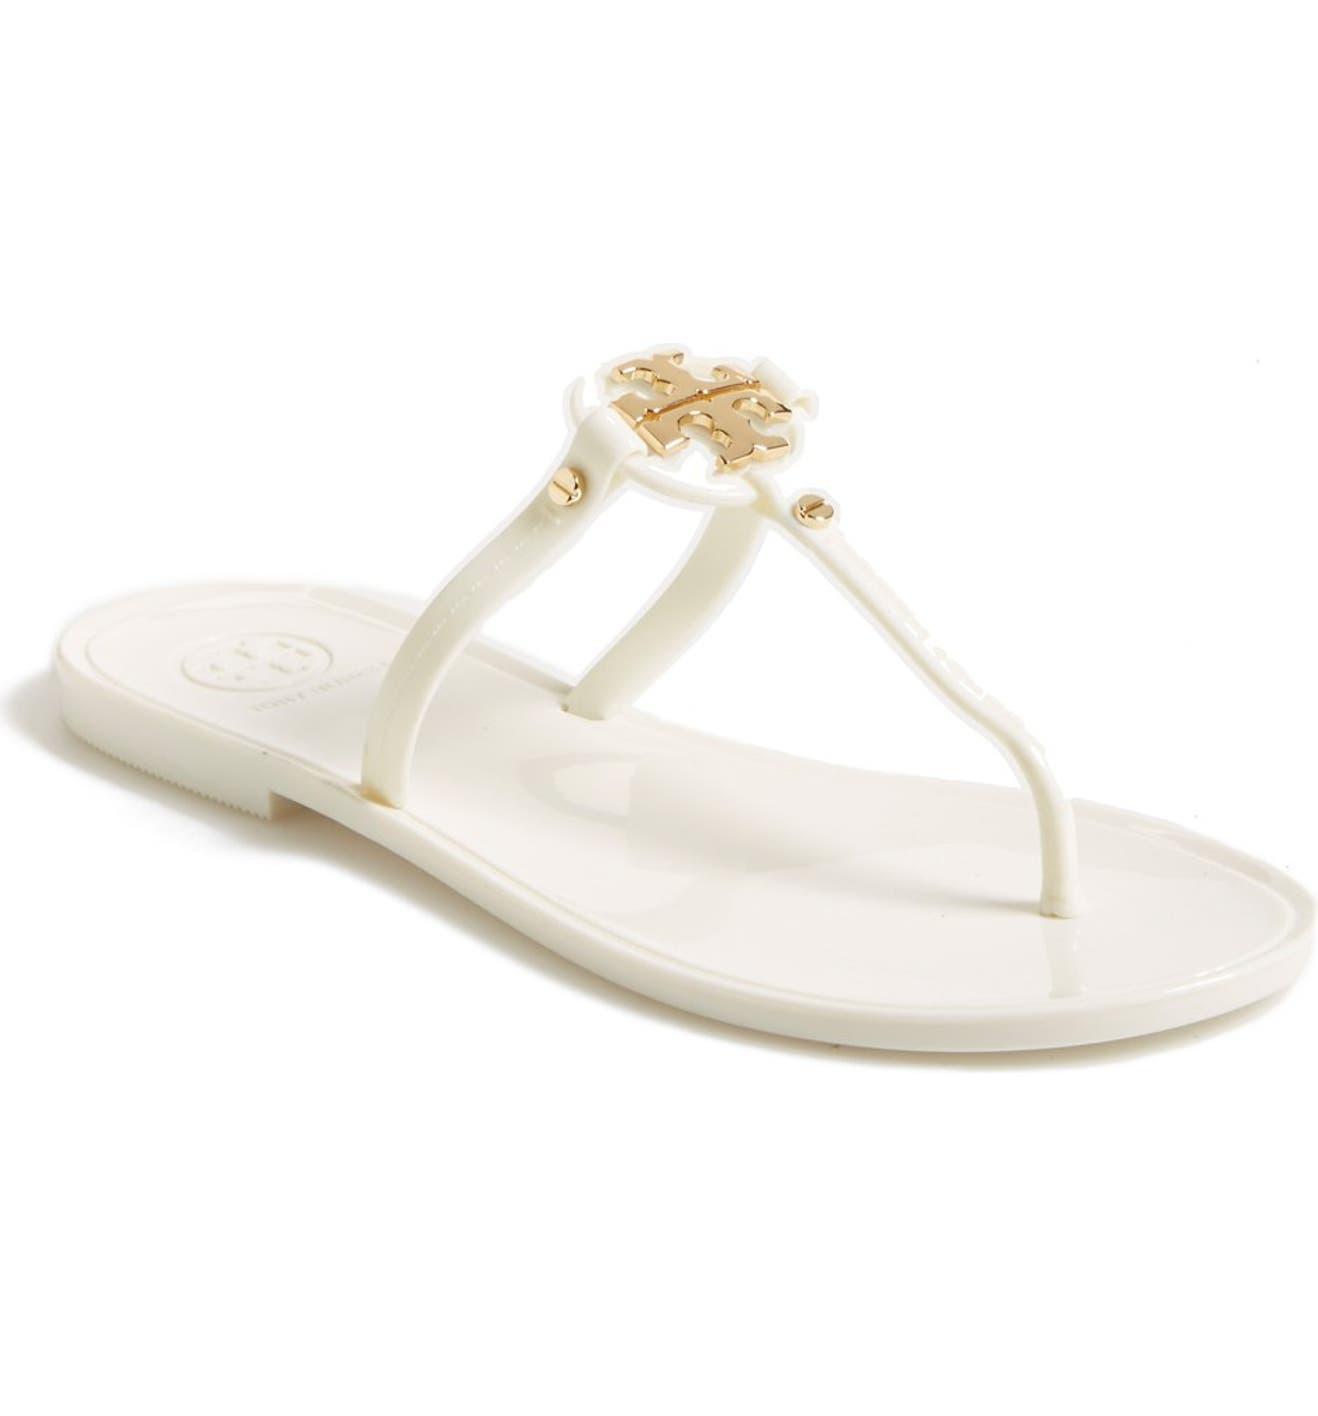 34c0940a7 Tory Burch  Mini Miller  Flat Sandal (Women)